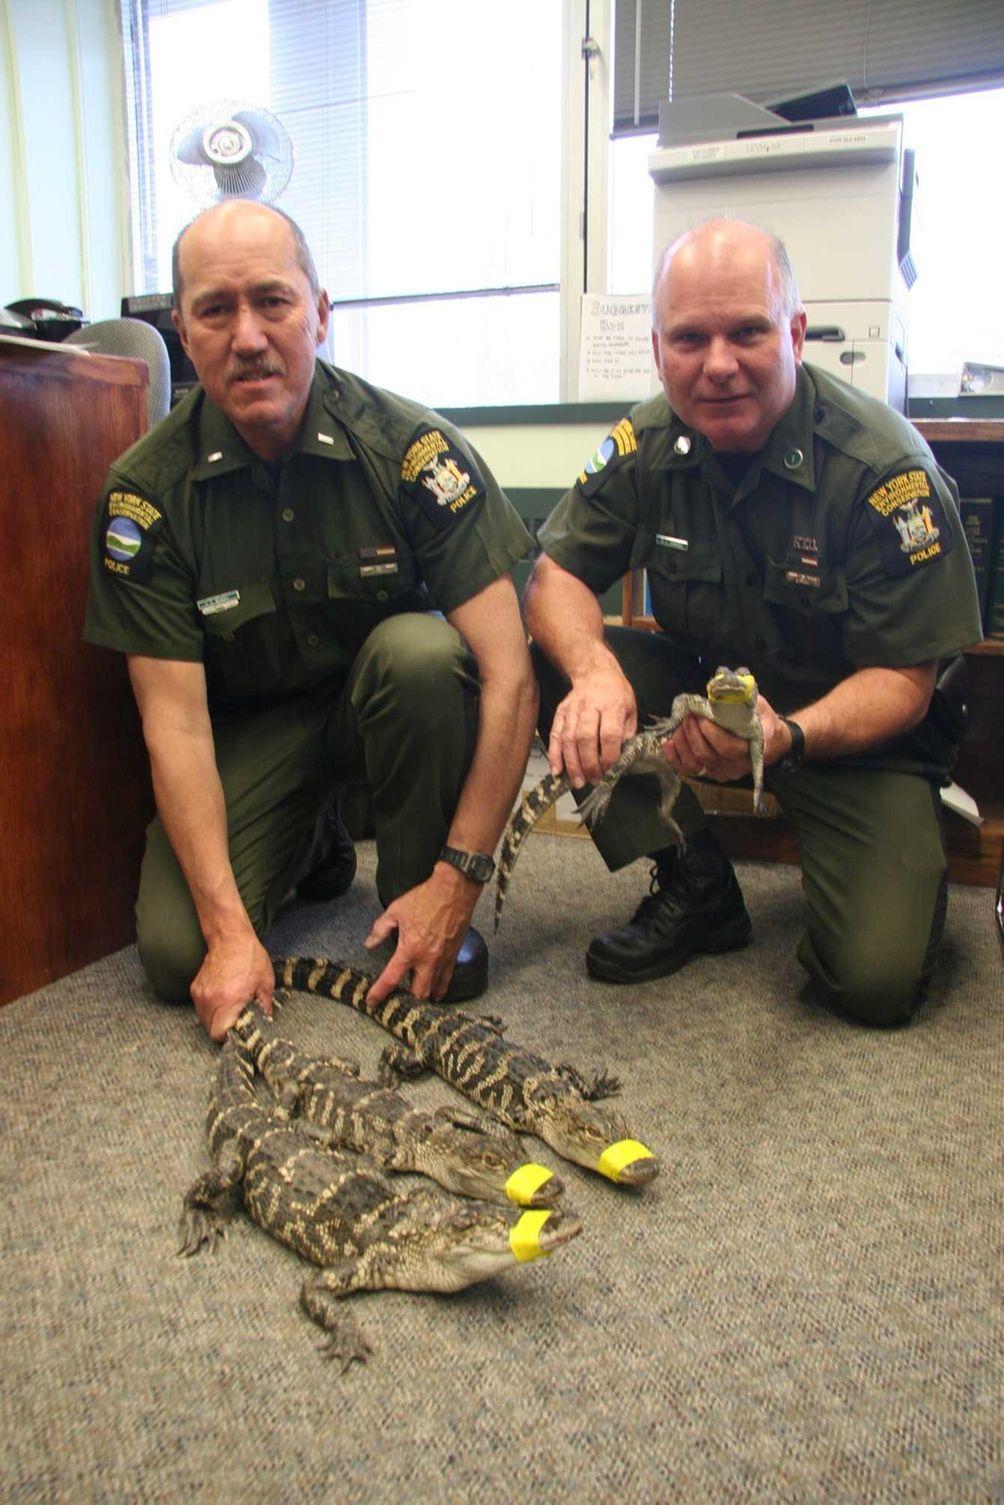 Department of Environmental Conservation Lt. Dallas Bengel, left,